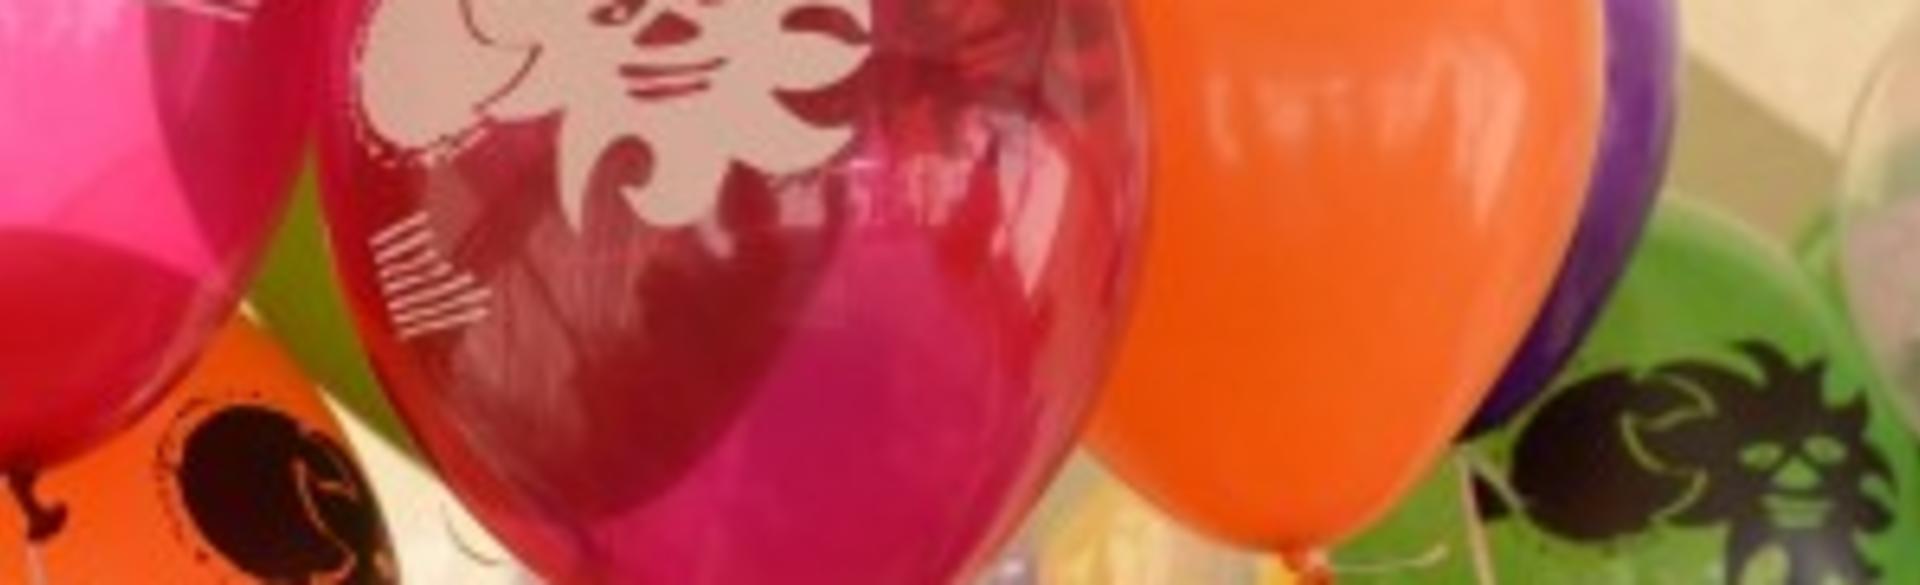 Festival Assorted Balloons